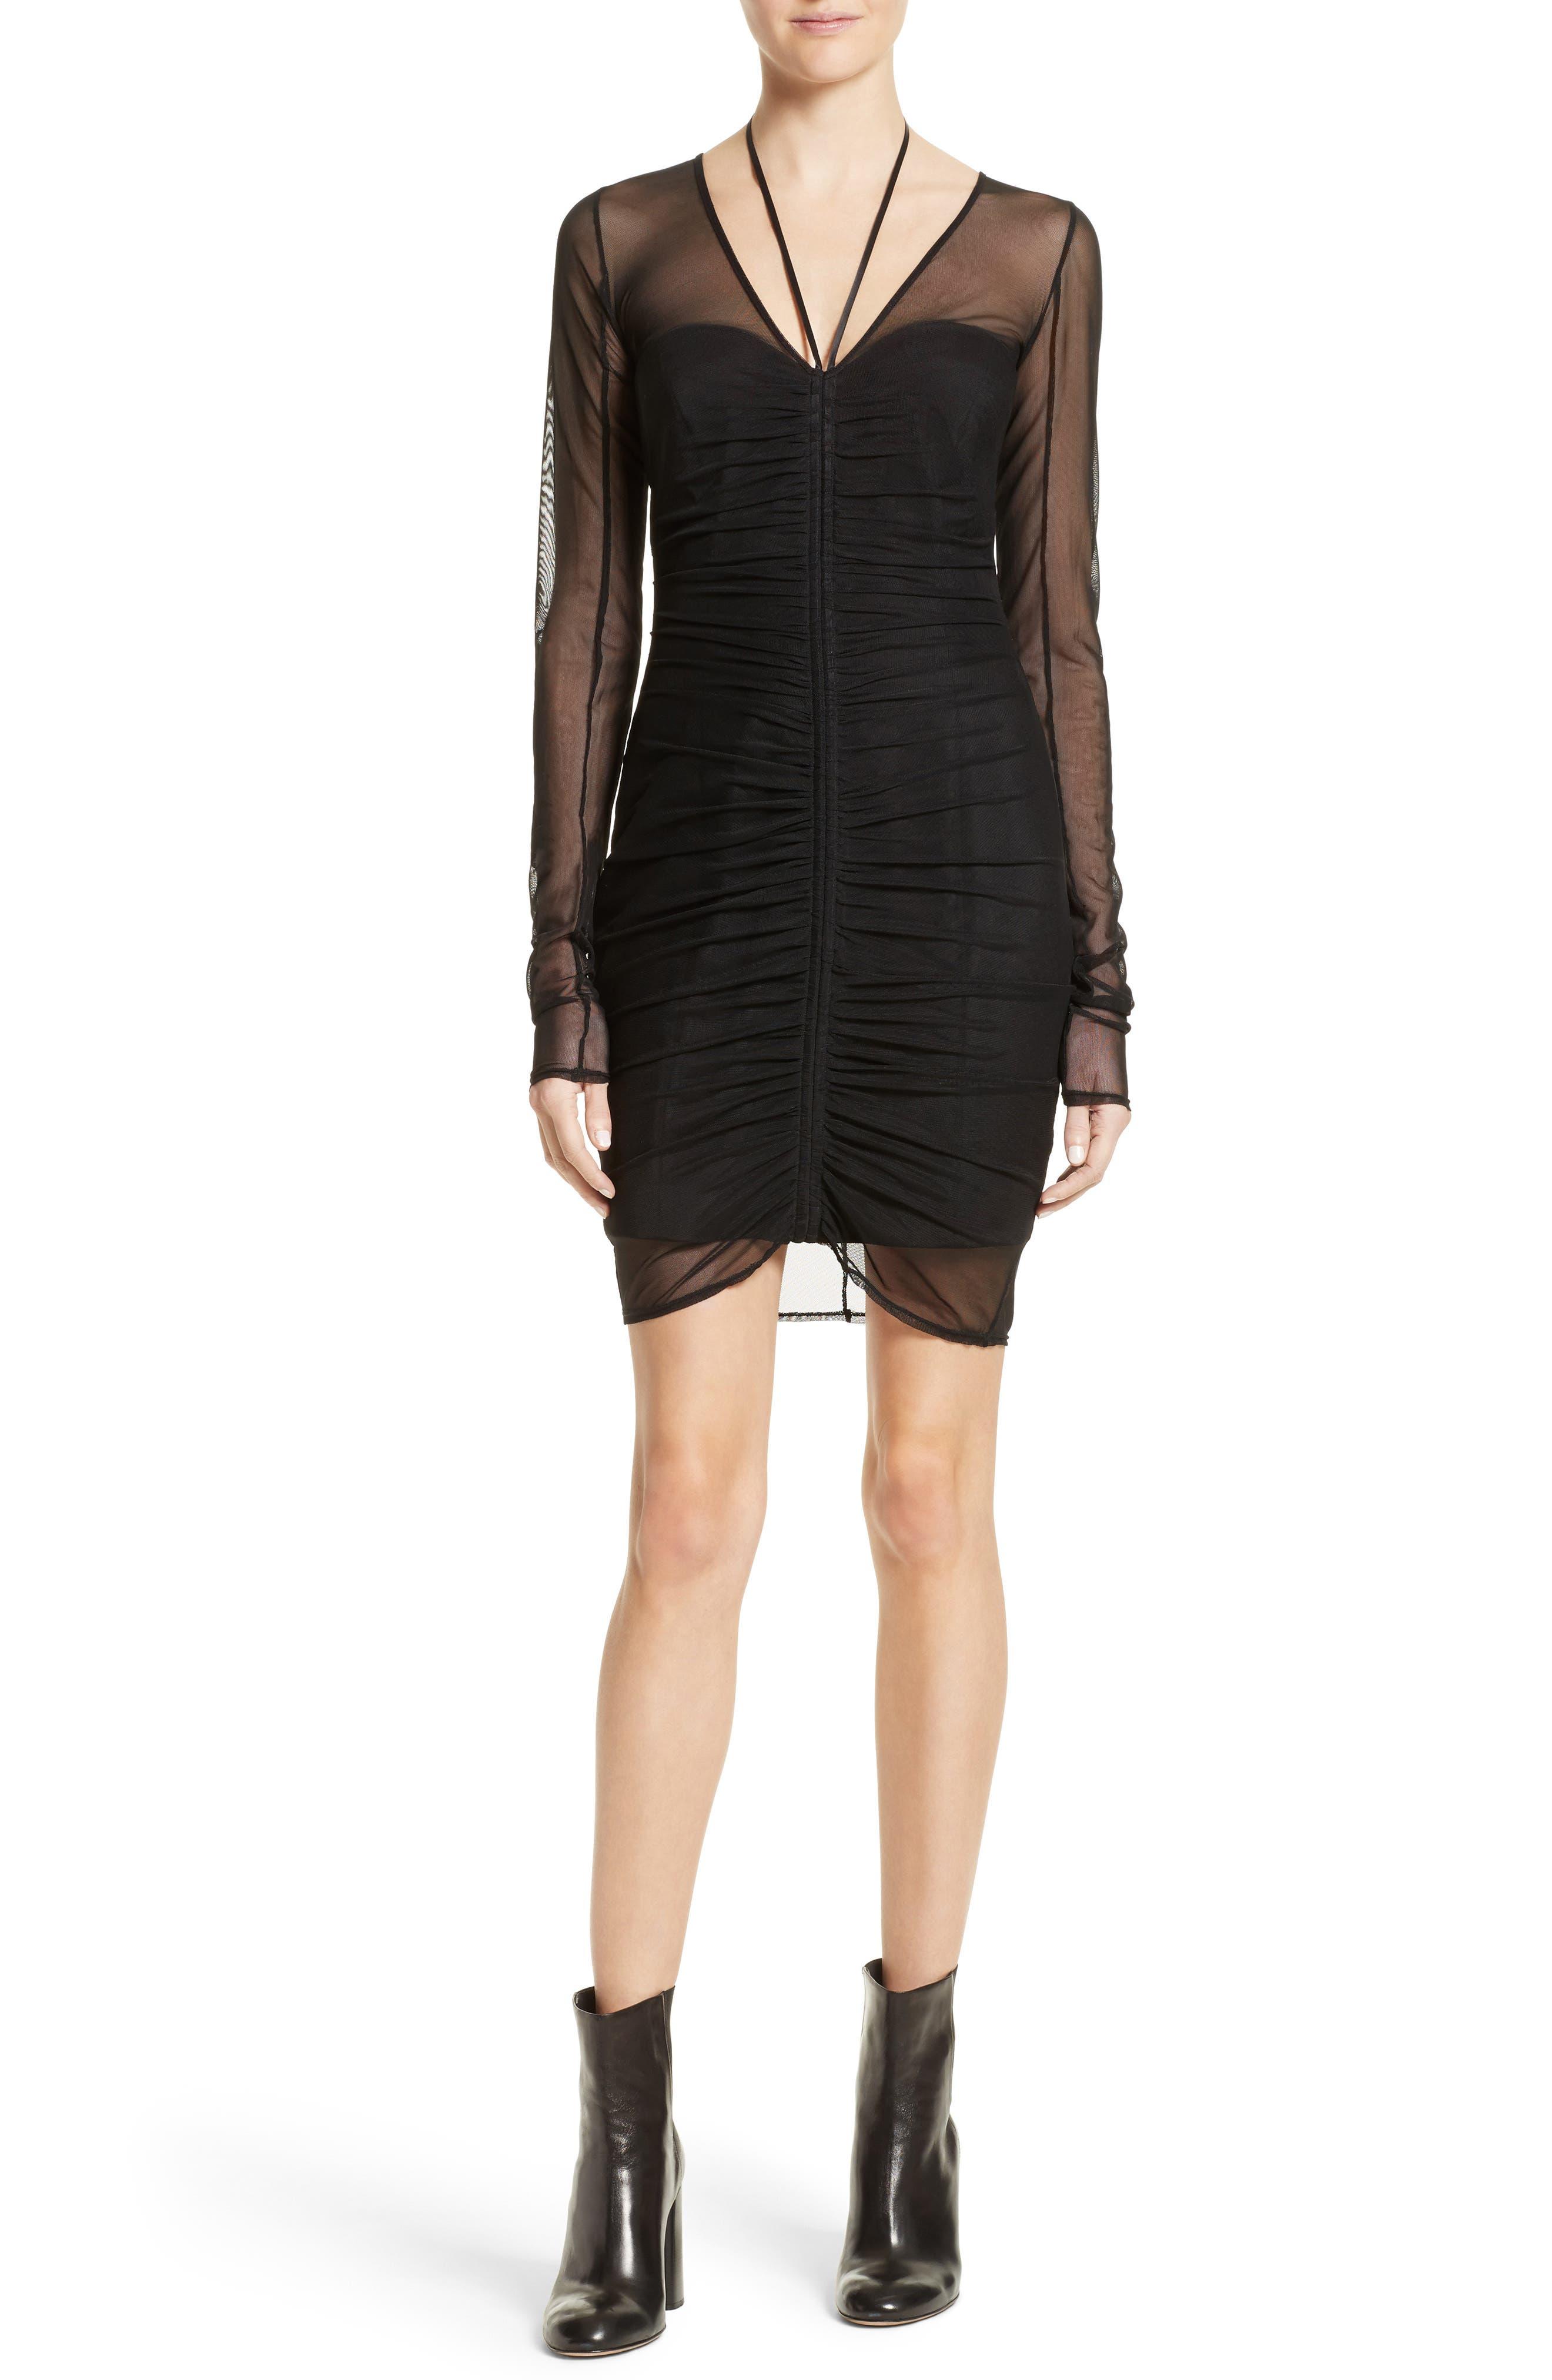 Main Image - Cinq à Sept Grant Mesh Dress